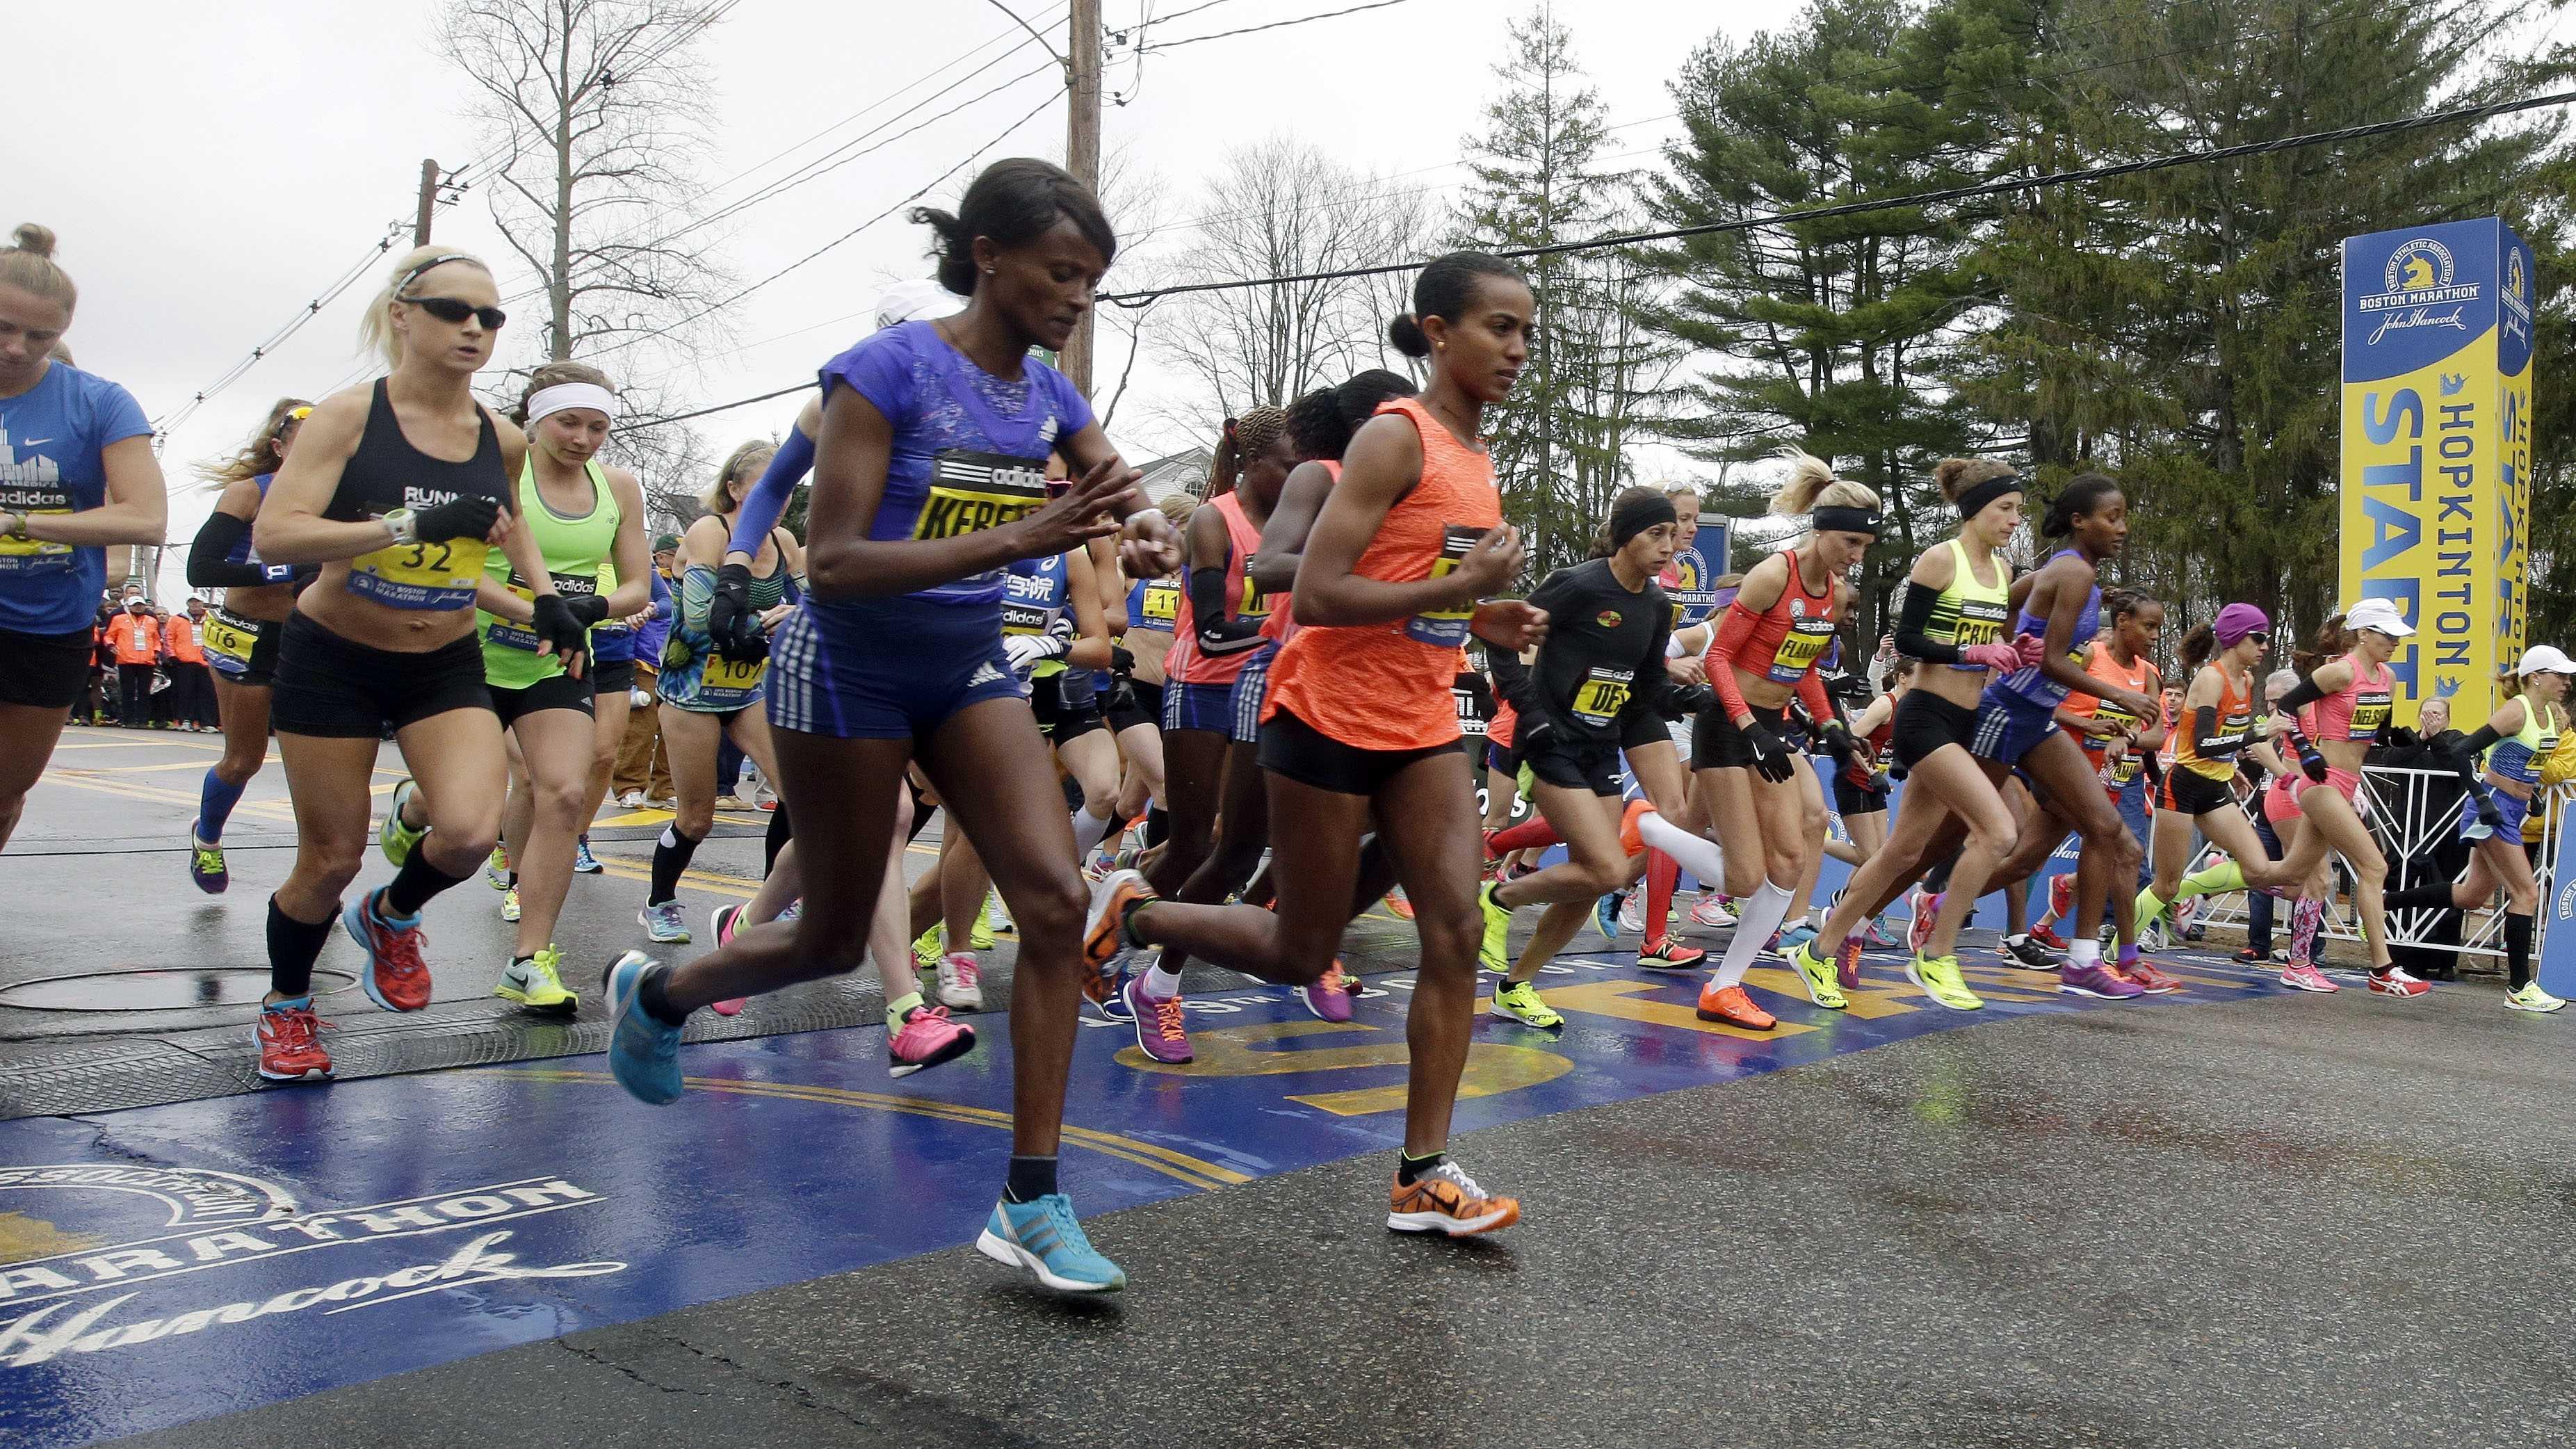 Runners cross the start line in the women's division of Boston Marathon Monday, April 20, 2015 in Hopkinton, Mass.